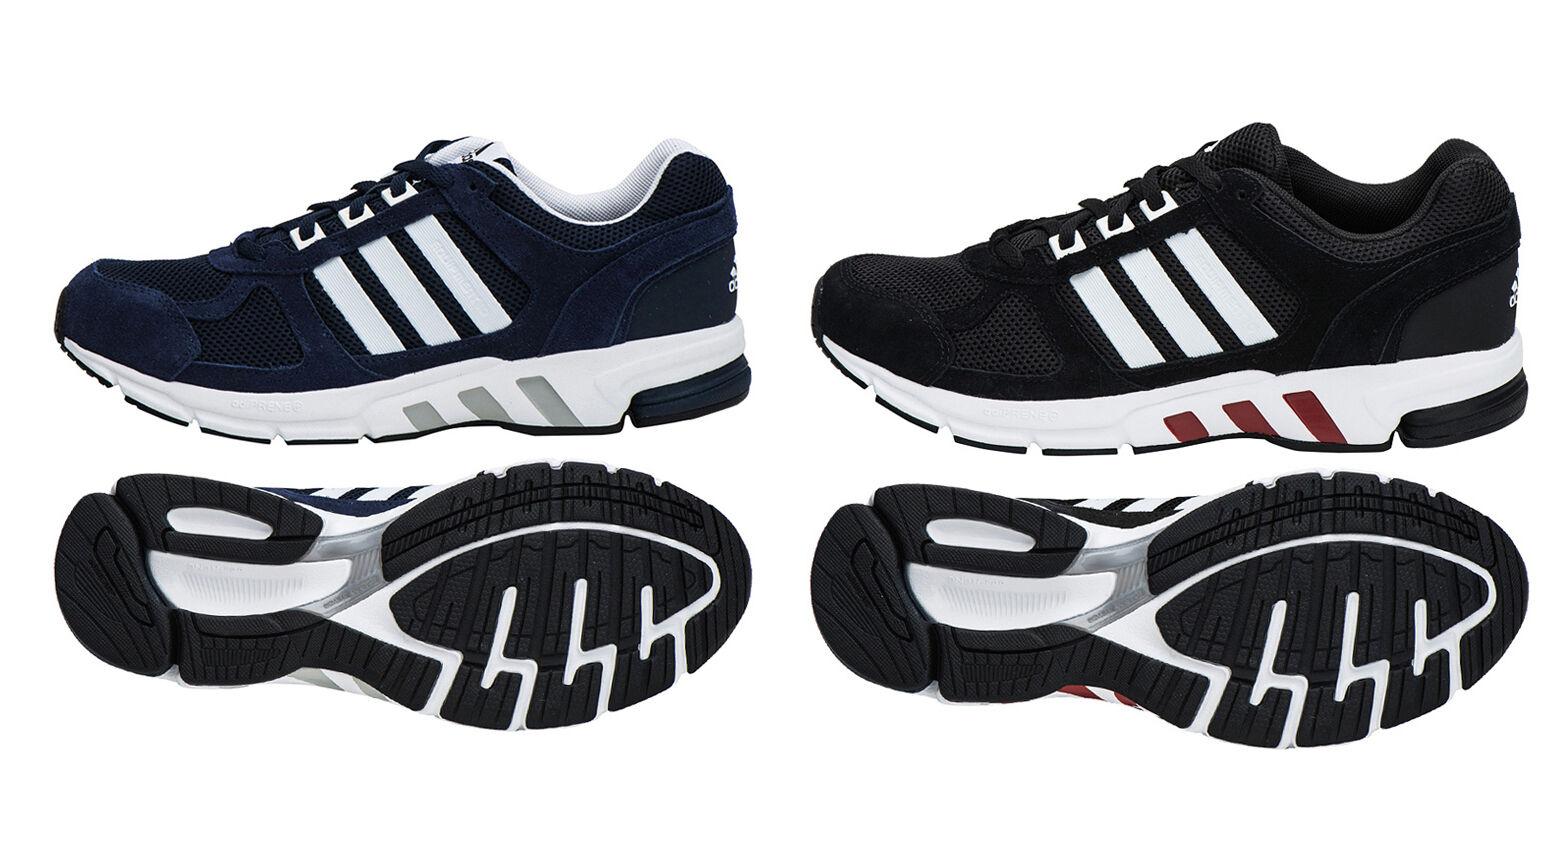 Shoes Adidas Running BW1264 Equipment 10 BW1338 Shoes Running qxxw4pAtzC